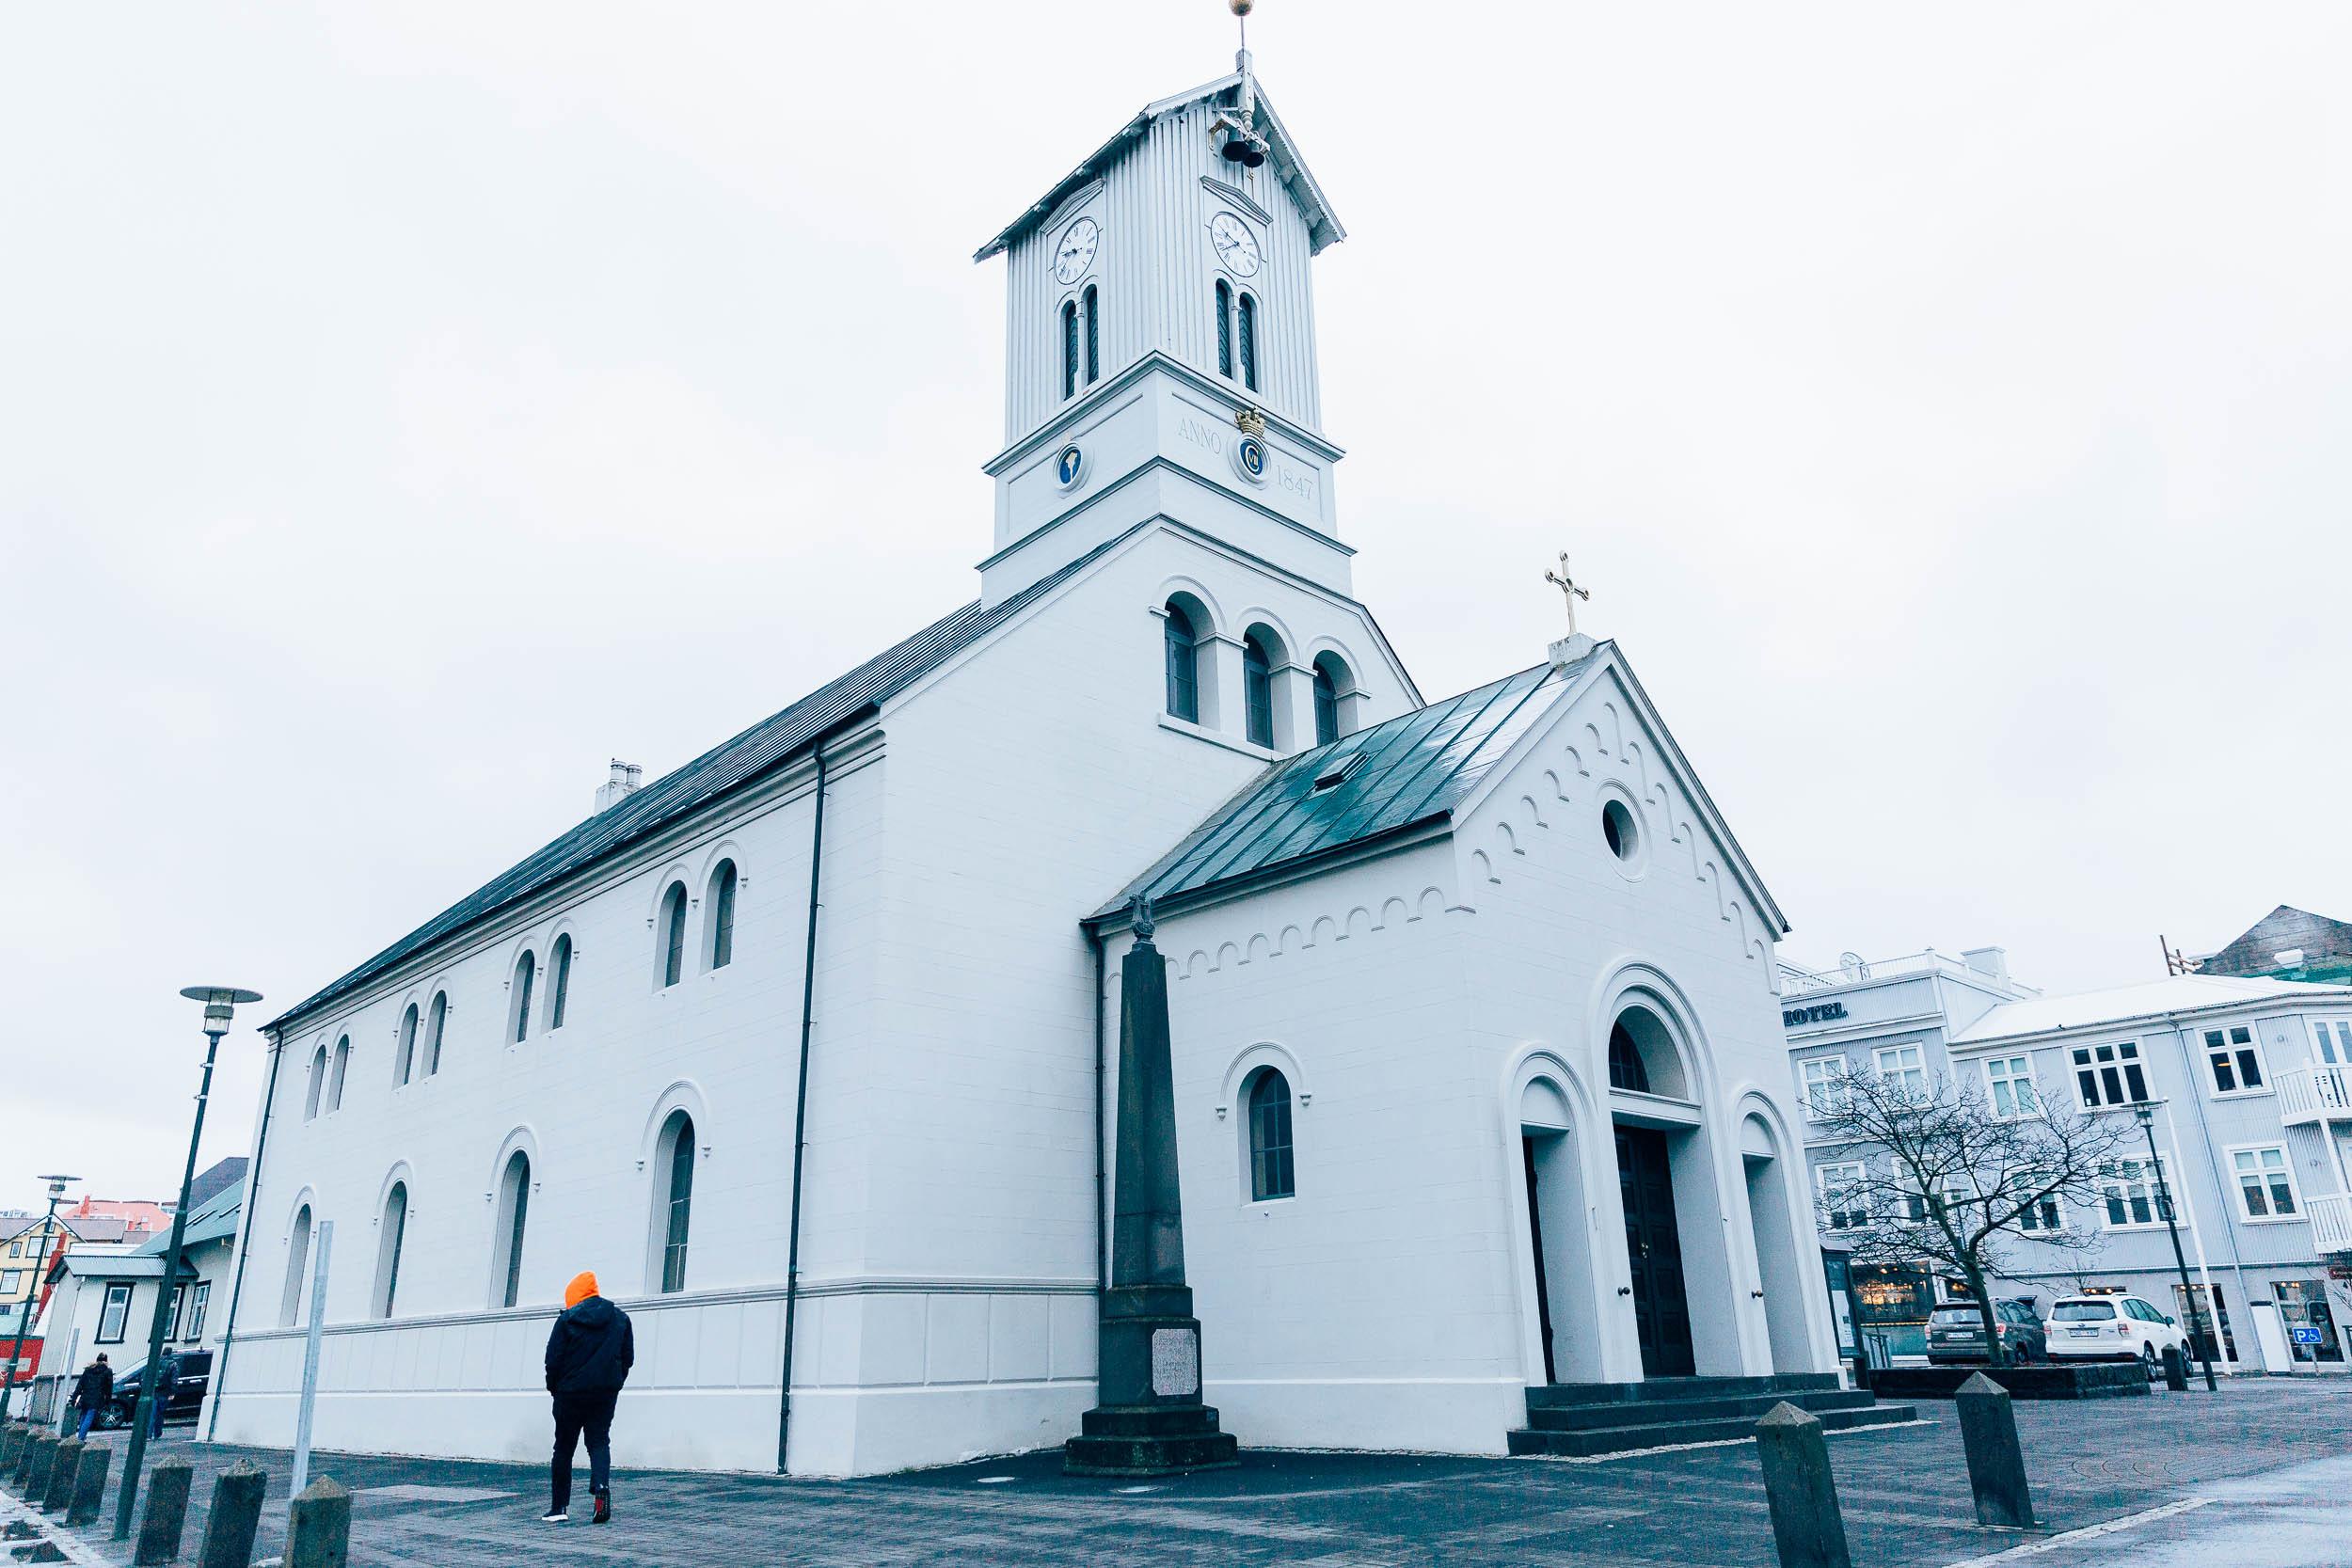 02_2019_Iceland-10.jpg